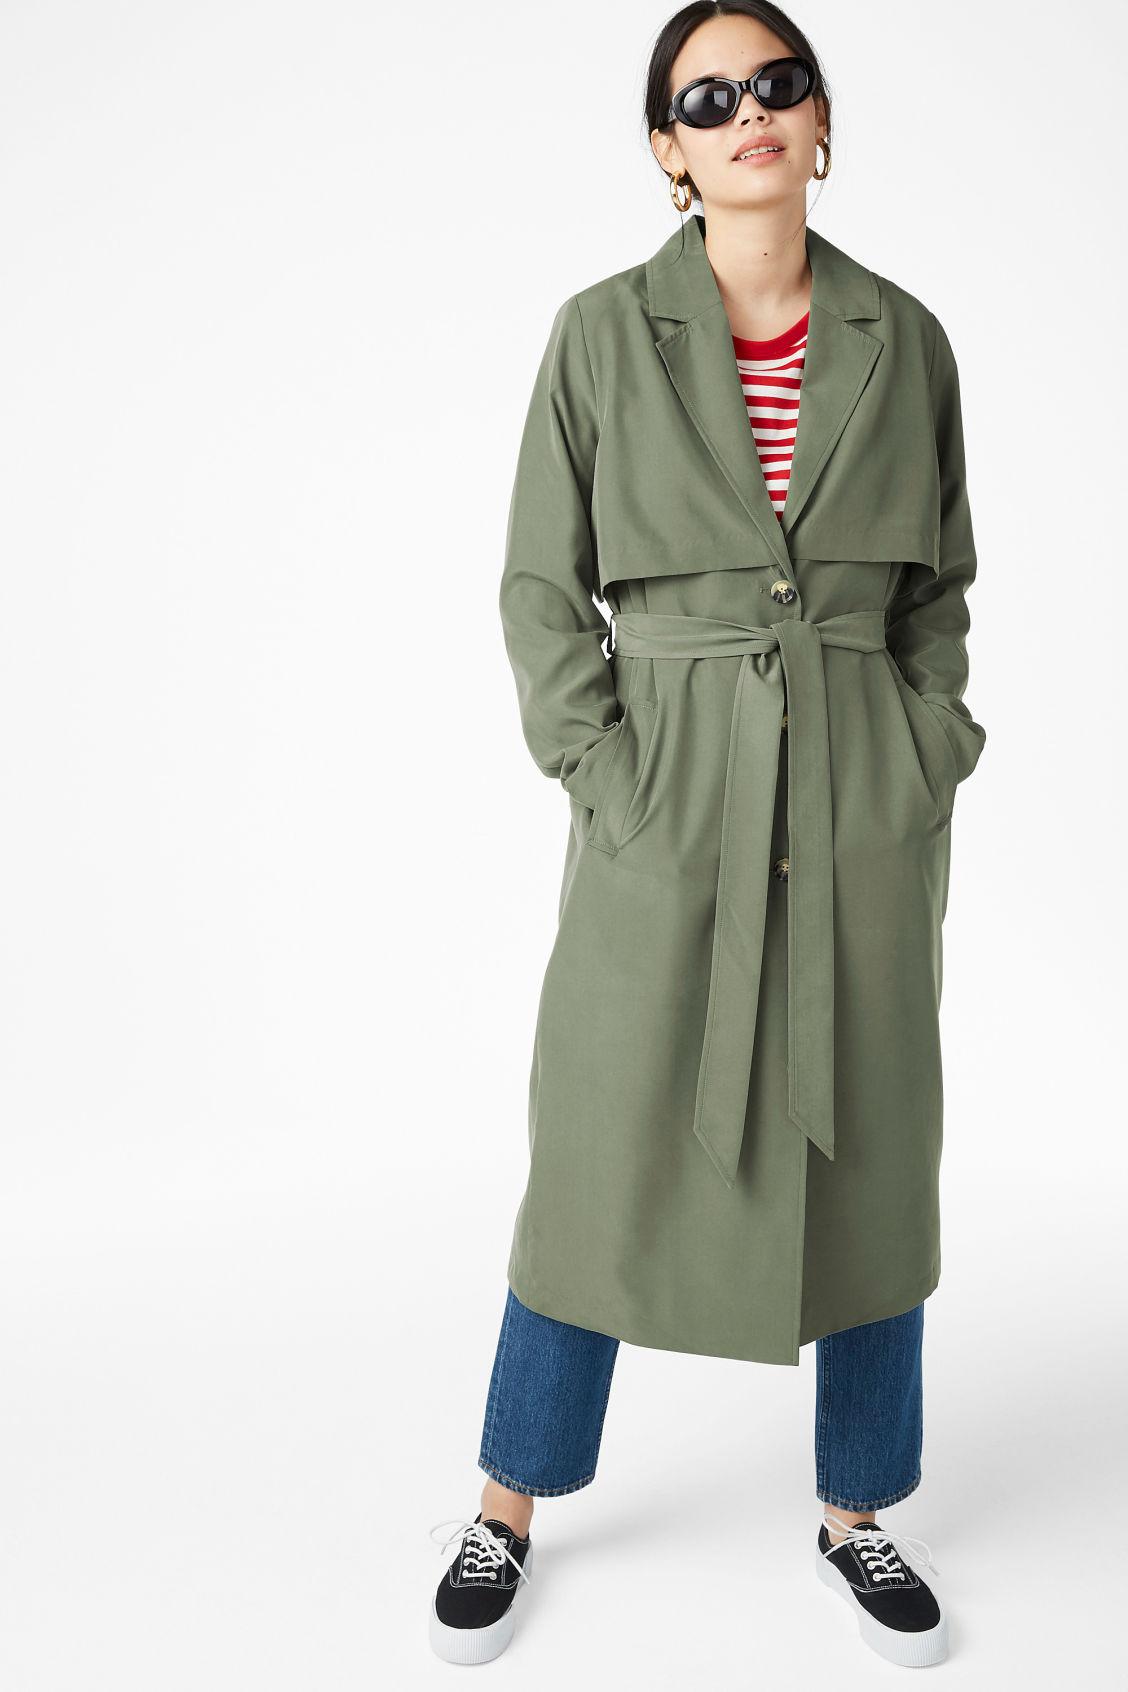 260b2d9b Please Coats Two Monki Olives Coat Soft amp; Jackets Trench qUvZwInzxH